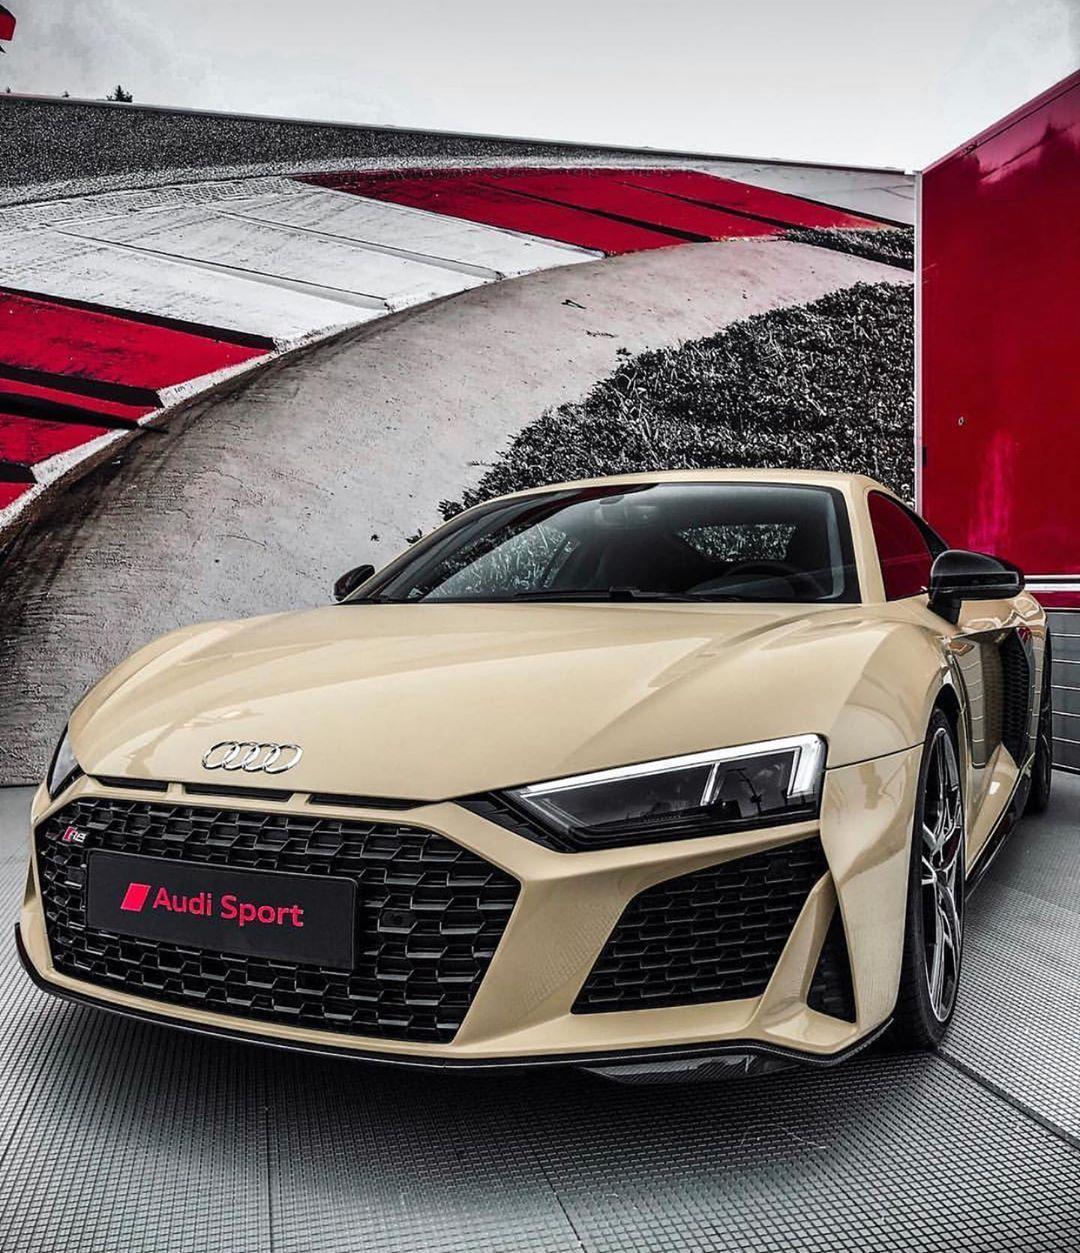 Best 77 Audi R8 Super Sports Car Collections Affordable Https Pistoncars Com Best 77 Audi R8 Super Sports Car Collectio Super Sport Cars Sports Car Audi Cars